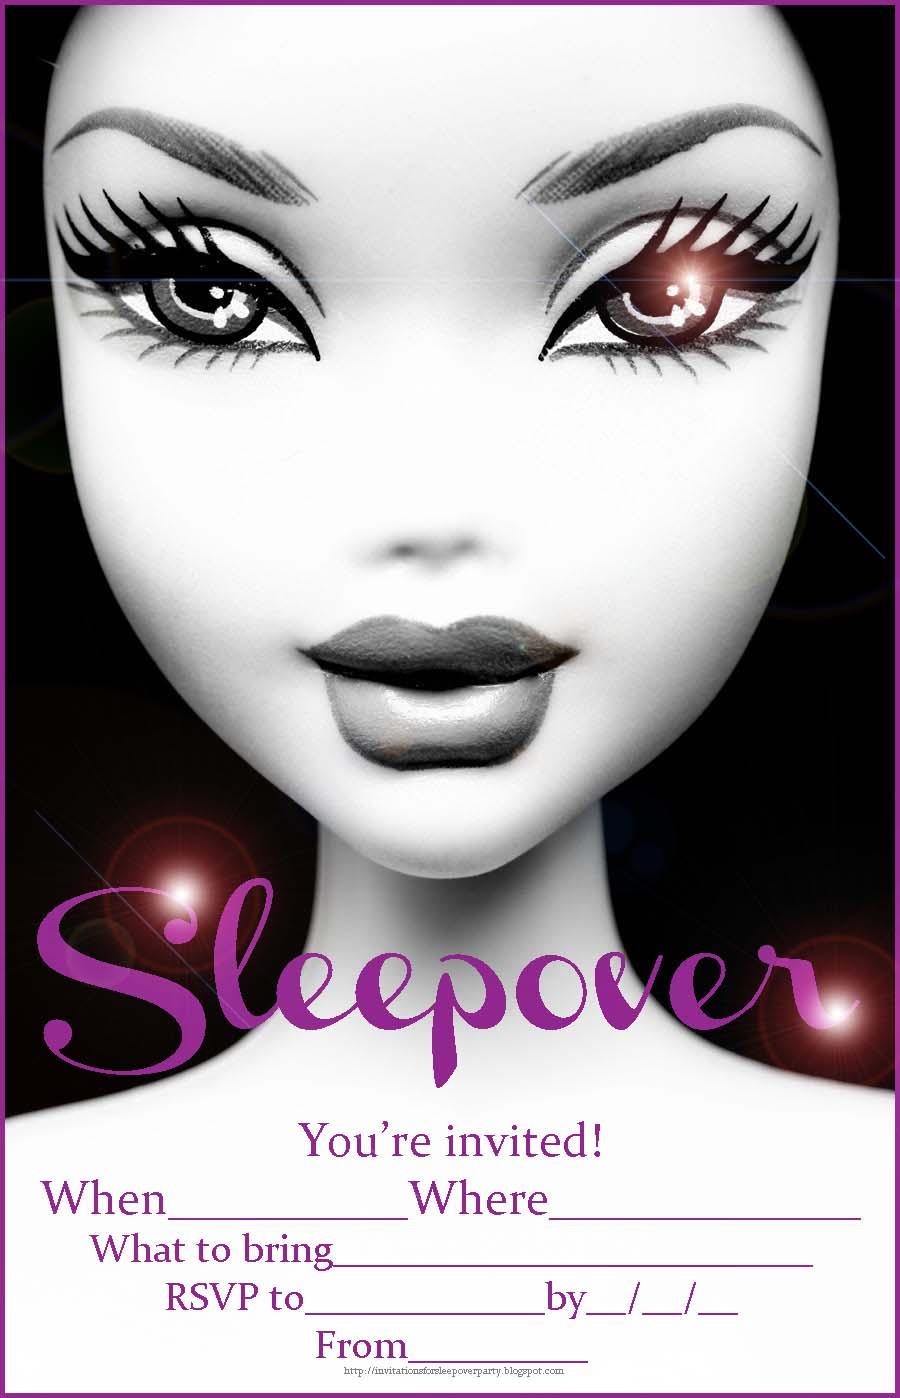 Pajama Party Invitations Free Printable for luxury invitations example